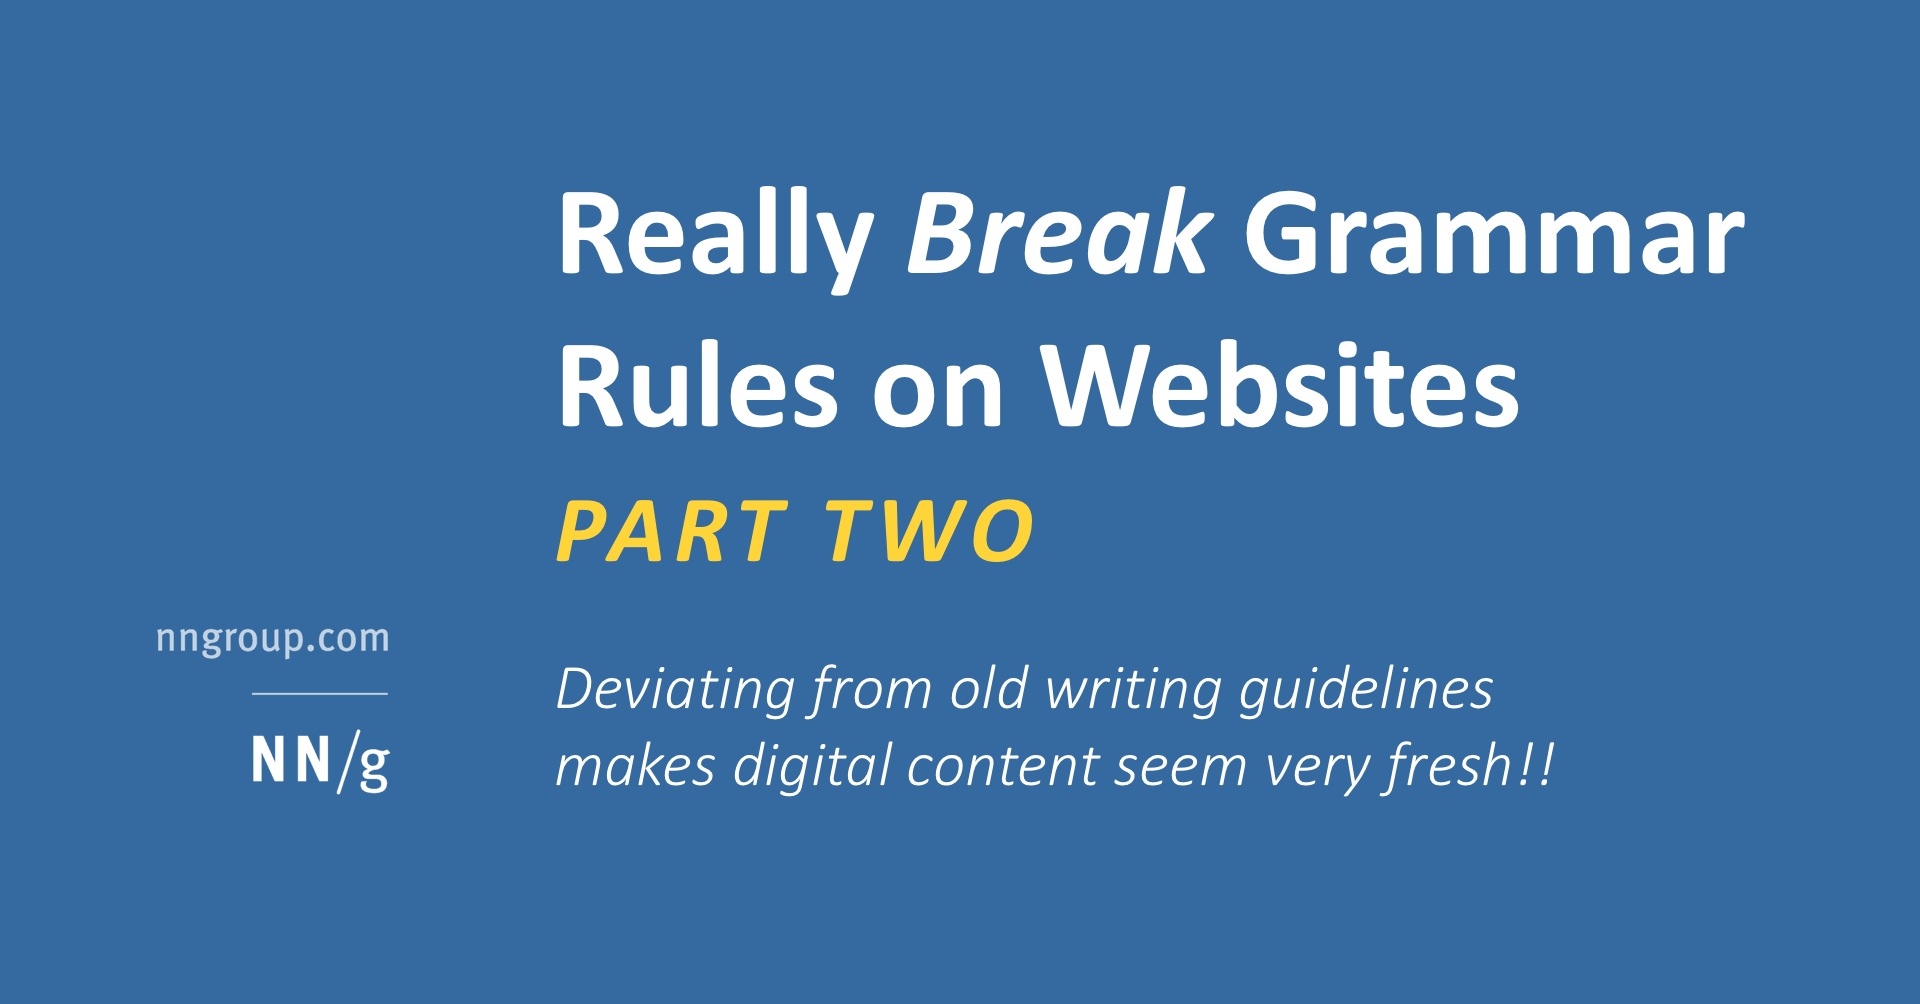 Really Break Grammar Rules on Websites: Part 2